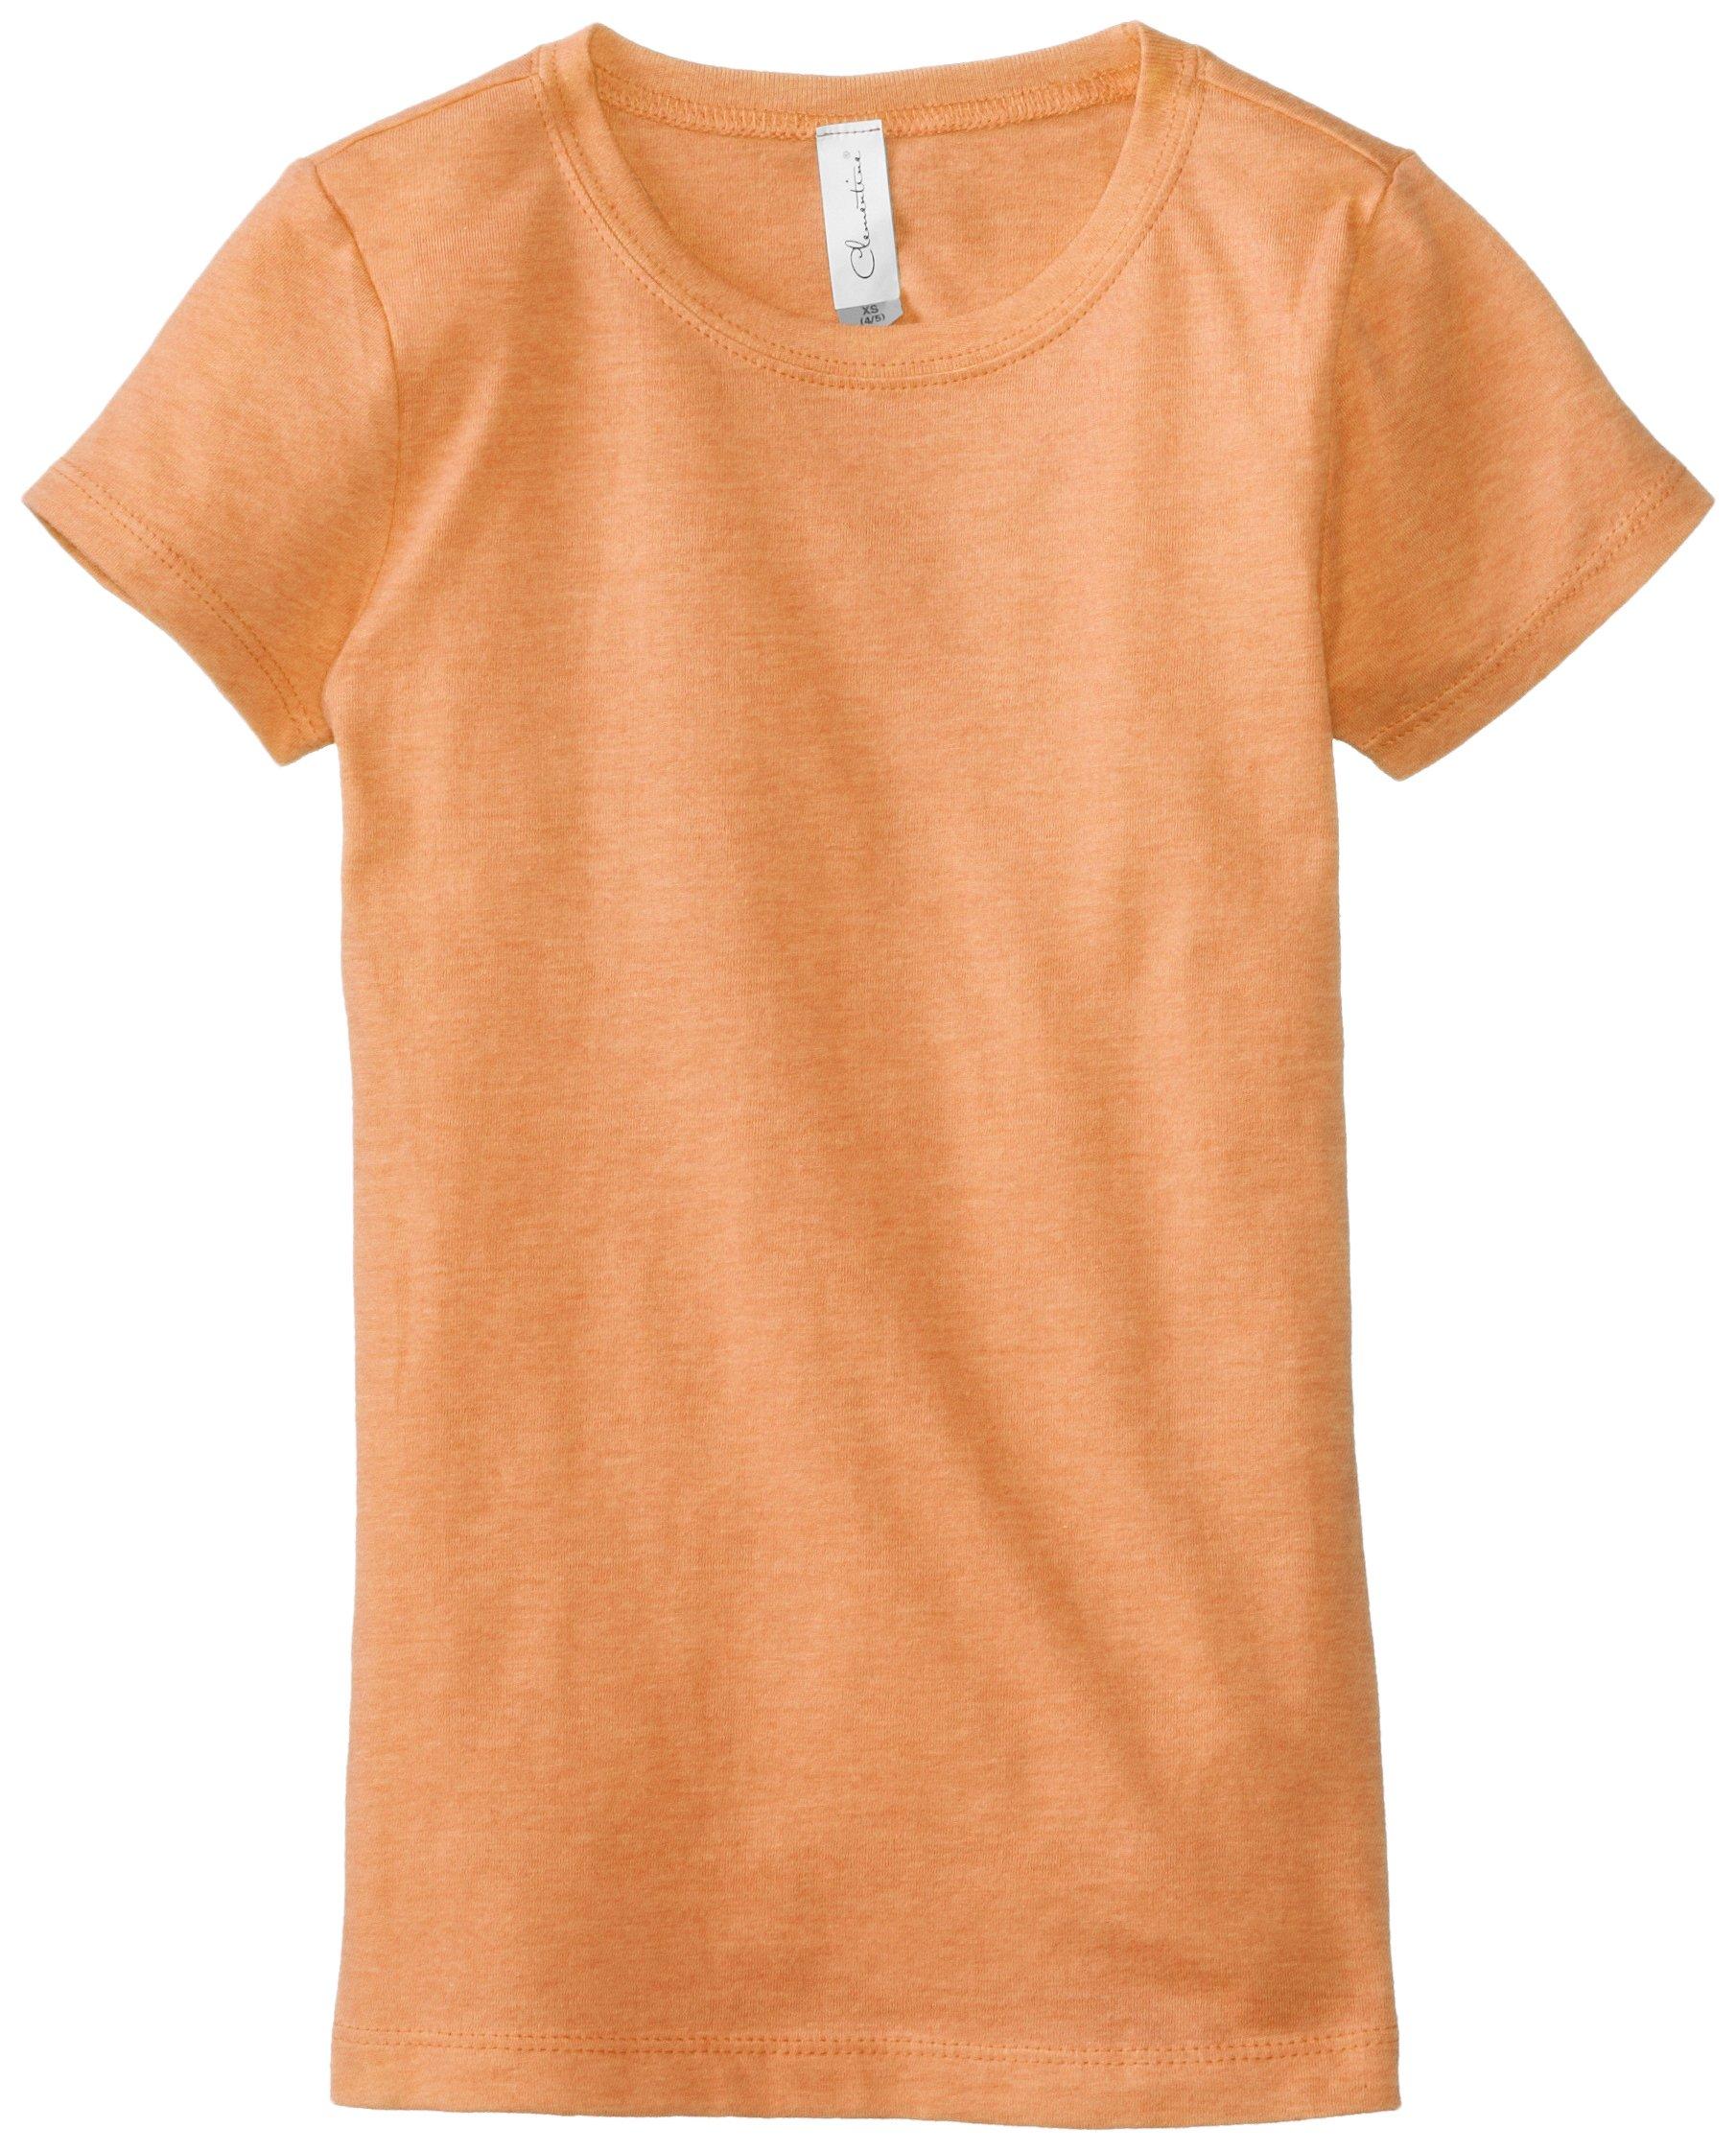 Clementine Big Girls' Everyday T-Shirt, Neon Heather Orange, Large(10-12)